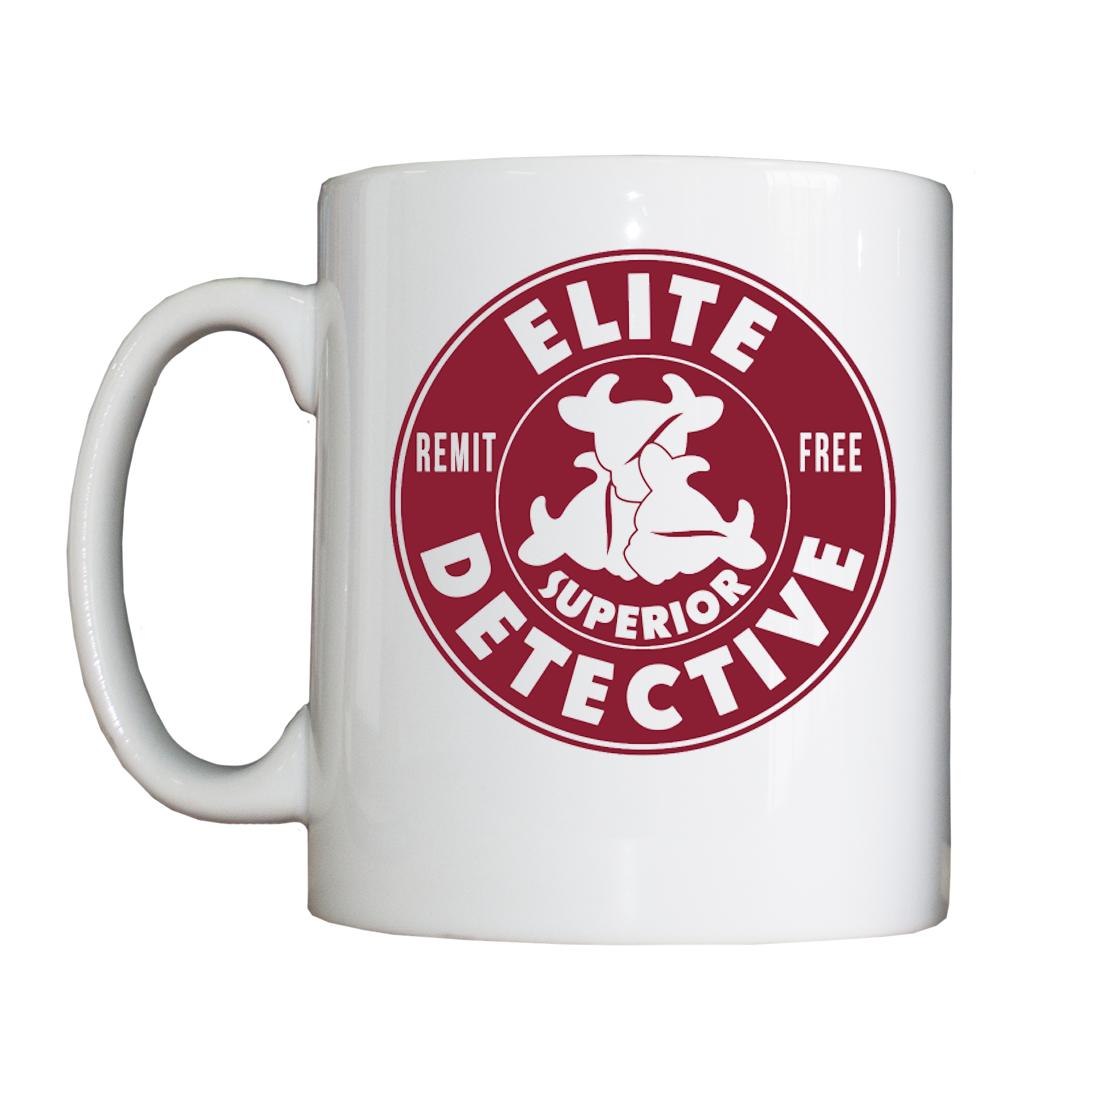 Personalised 'Elite Detective' Vessel NewEliteDetectiveVessel